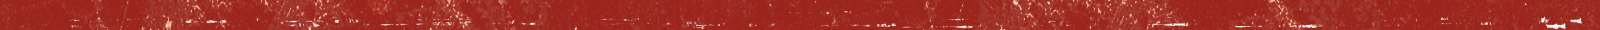 Red Divider